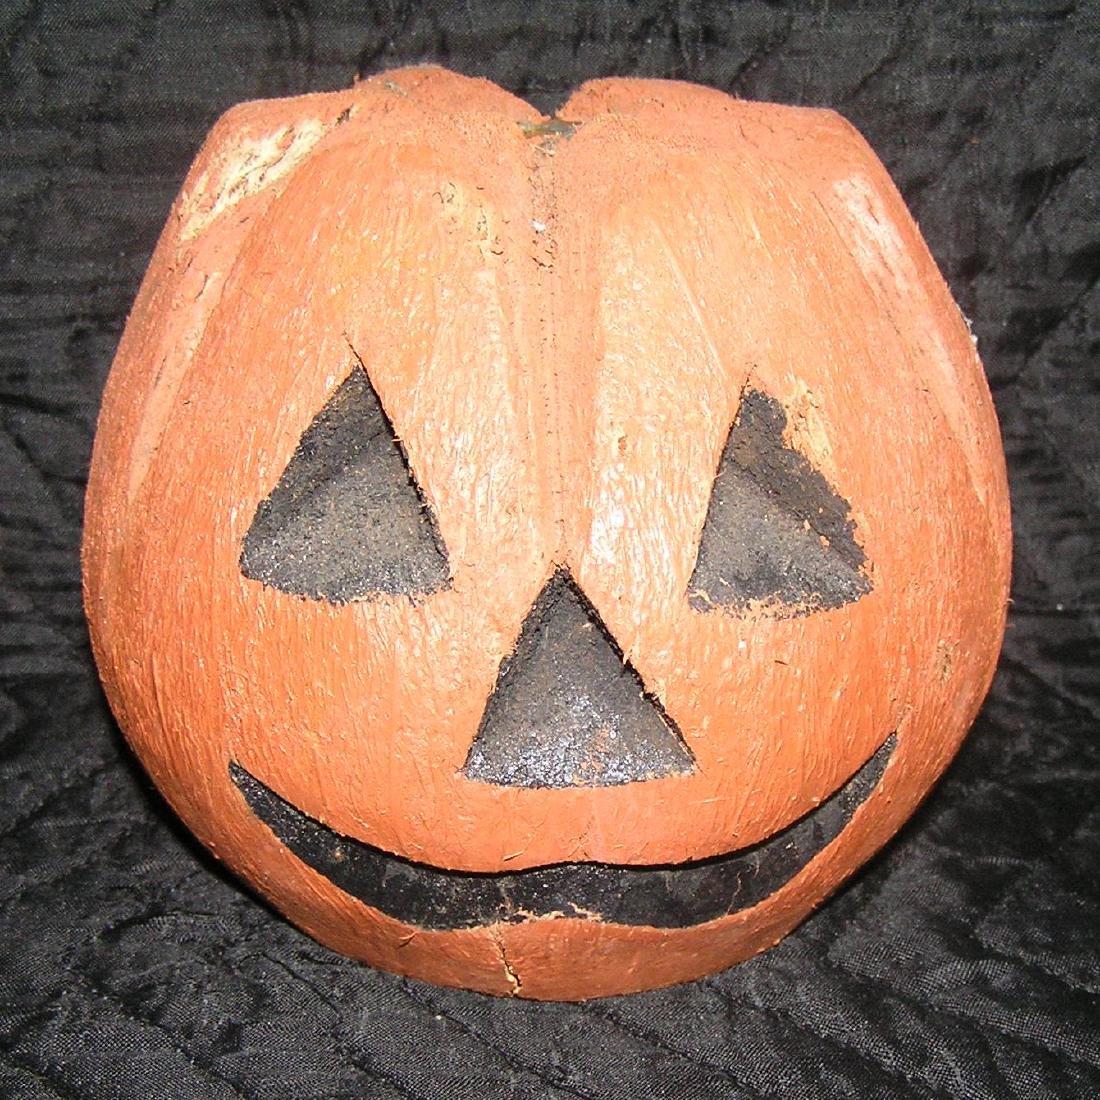 Vintage Jack O Lantern carved from an old coconut